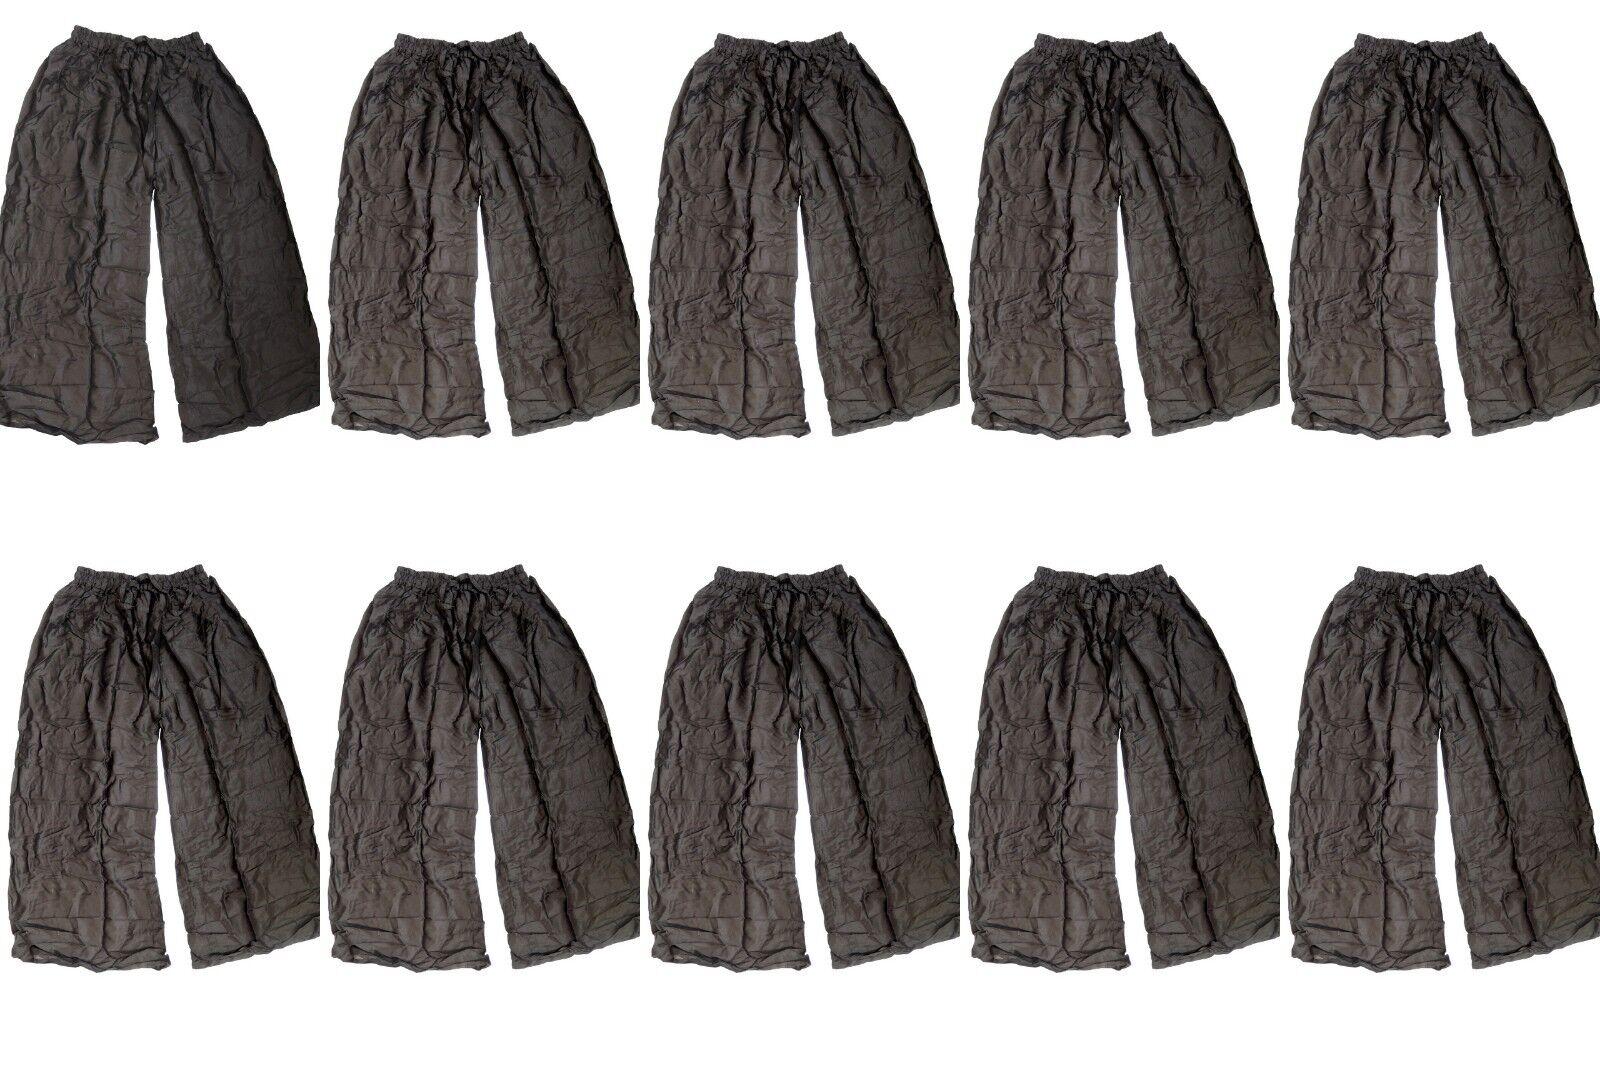 12 WHOLESALE LOT NDIA YOGA PANTS HAREM BELLY DANCING  EXERCISE PANTS SET OF 12